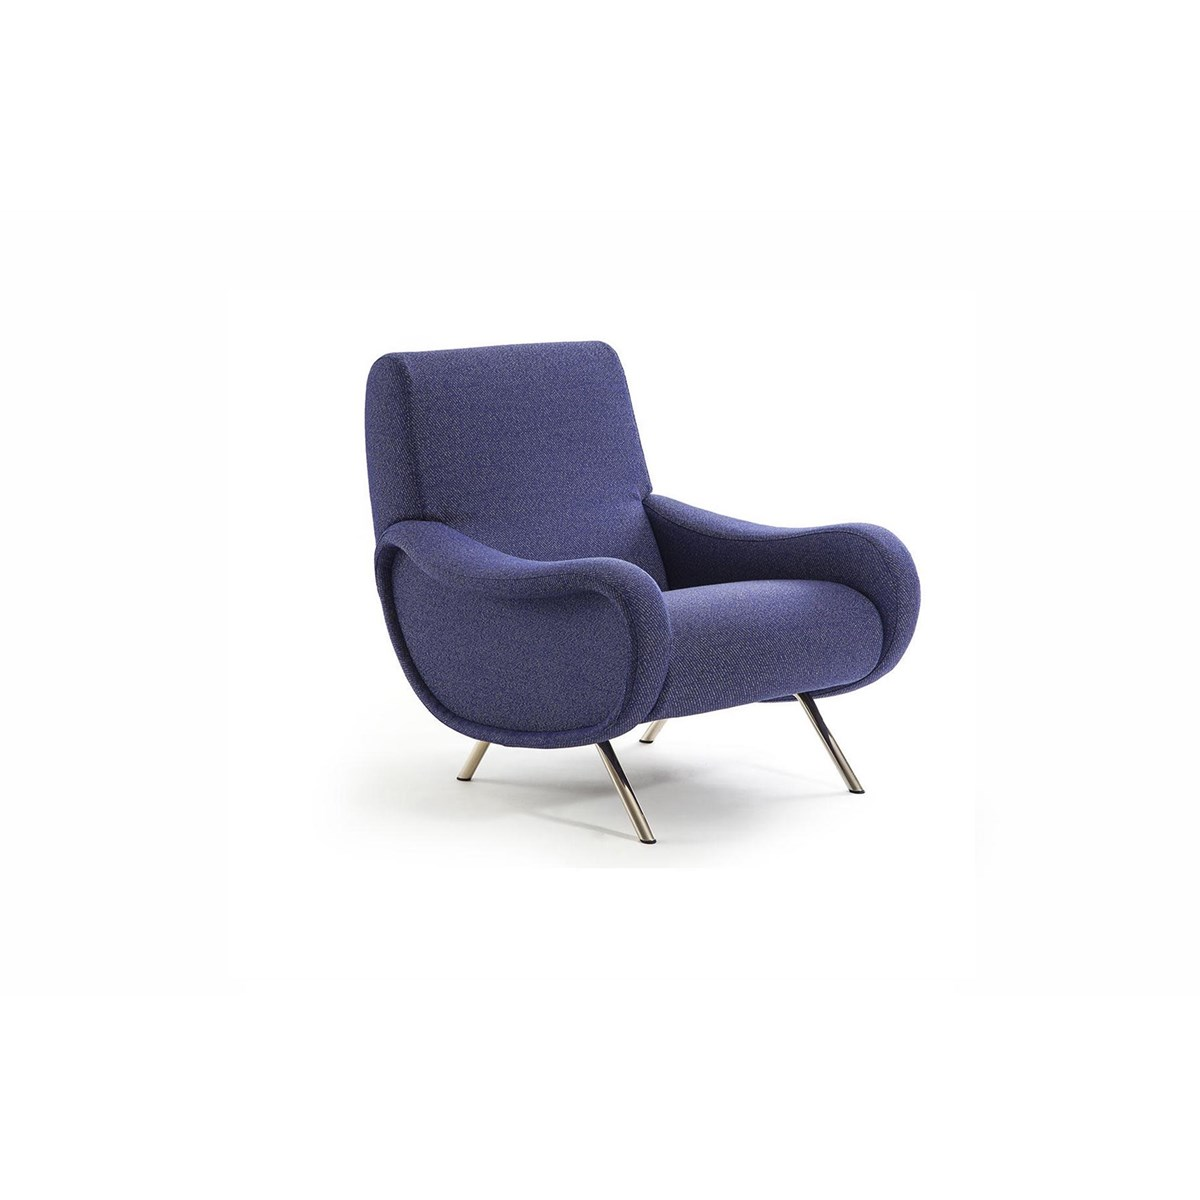 Cassina-Marco-Zanuso-Lady-Armchair-Matisse-1 (1)